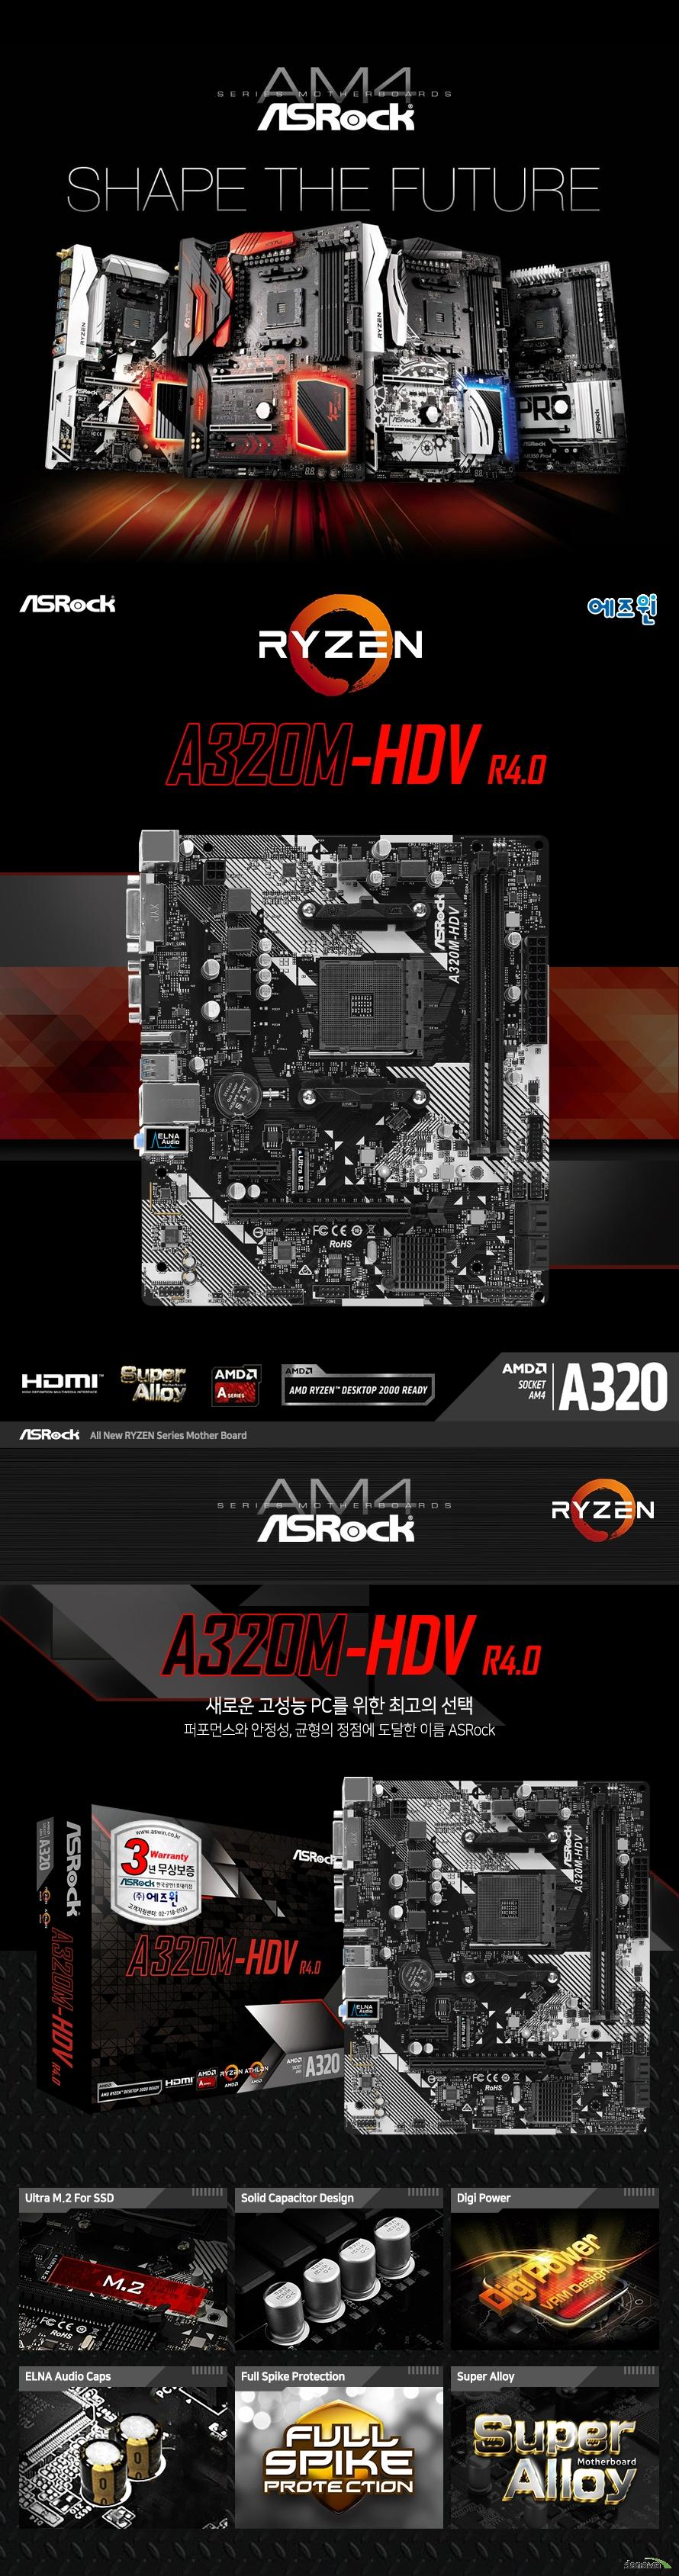 ASRock A320M-HDV R4.0 에즈윈  마이크로 ATX 폼팩터 규격 가로 20.1 센티미터 세로 23 센티미터  AMD AM4 소켓 지원 라이젠 CPU 및 A 시리즈 APU 지원  AMD A320칩셋 적용  듀얼 채널 DDR4 메모리 슬롯 2개 총 32GB 지원 AMD 라이젠 피나클 릿지 CPU에서 3200 2933 2667 2400 2133 ECC 및 NON ECC 메모리 지원  AMD 라이젠 서밋 릿지 CPU에서 3200 2933 2667 2400 2133 ECC 및 NON ECC 메모리 지원  AMD 라이젠 레이븐 릿지 CPU에서 3200 2933 2667 2400 2133 NON ECC 메모리 지원  AMD 7세대 A 시리즈 APU에서 2400 2133 non ecc 메모리 지원   확장슬롯지원  Amd 라이젠 서밋 릿지 및 피나클 릿지 cpu에서  Pcie 3.0 16배속 슬롯 1개 지원  Amd 라이젠 레이븐 릿지 cpu에서 Pcie 3.0 16배속 슬롯 1개 지원 및 8배속으로 동작 만약 애슬론 2xxge 시리즈 apu를 사용하면 pcie2 슬롯은 4배속으로 작동합니다.  Amd 7세대 시리즈 apu에서 Pcie 3.0 16배속 슬롯 1개 지원 및 8배속으로 동작  Pcie 2.0 1배속 슬롯 지원  리얼텍 alc887 오디오 코덱 지원  리얼텍 rtl8111h 기가비트 랜 지원  Sata3 포트 4개 지원 2242 2260 2280 규격 울트라 m.2 소켓 1개 지원  Amd 라이젠 cpu에서 m.2 sata3 및 pcie gen3 4배속 지원  amd a 시리즈 apu 및 애슬론 2xxge 시리즈 apu에서 m.2 sata3 및 pcie gen3 2배속 지원 nvme ssd 부트 디스크 및 asrock u.2 키트 지원  usb 3.1 gen 1 포트 6개 지원 usb 2.0 포트 6개 지원  uefi 바이오스 지원  kc 인증번호 r r asr a320mhdvr3 파생모델  제조사의 사정에 따라 사전고지 없이 일부 제품사양이 변경될 수 있습니다. 구매 전 파워 서플라이의 cpu 프로세서 지원 여부를 확인하시기 바랍니다.